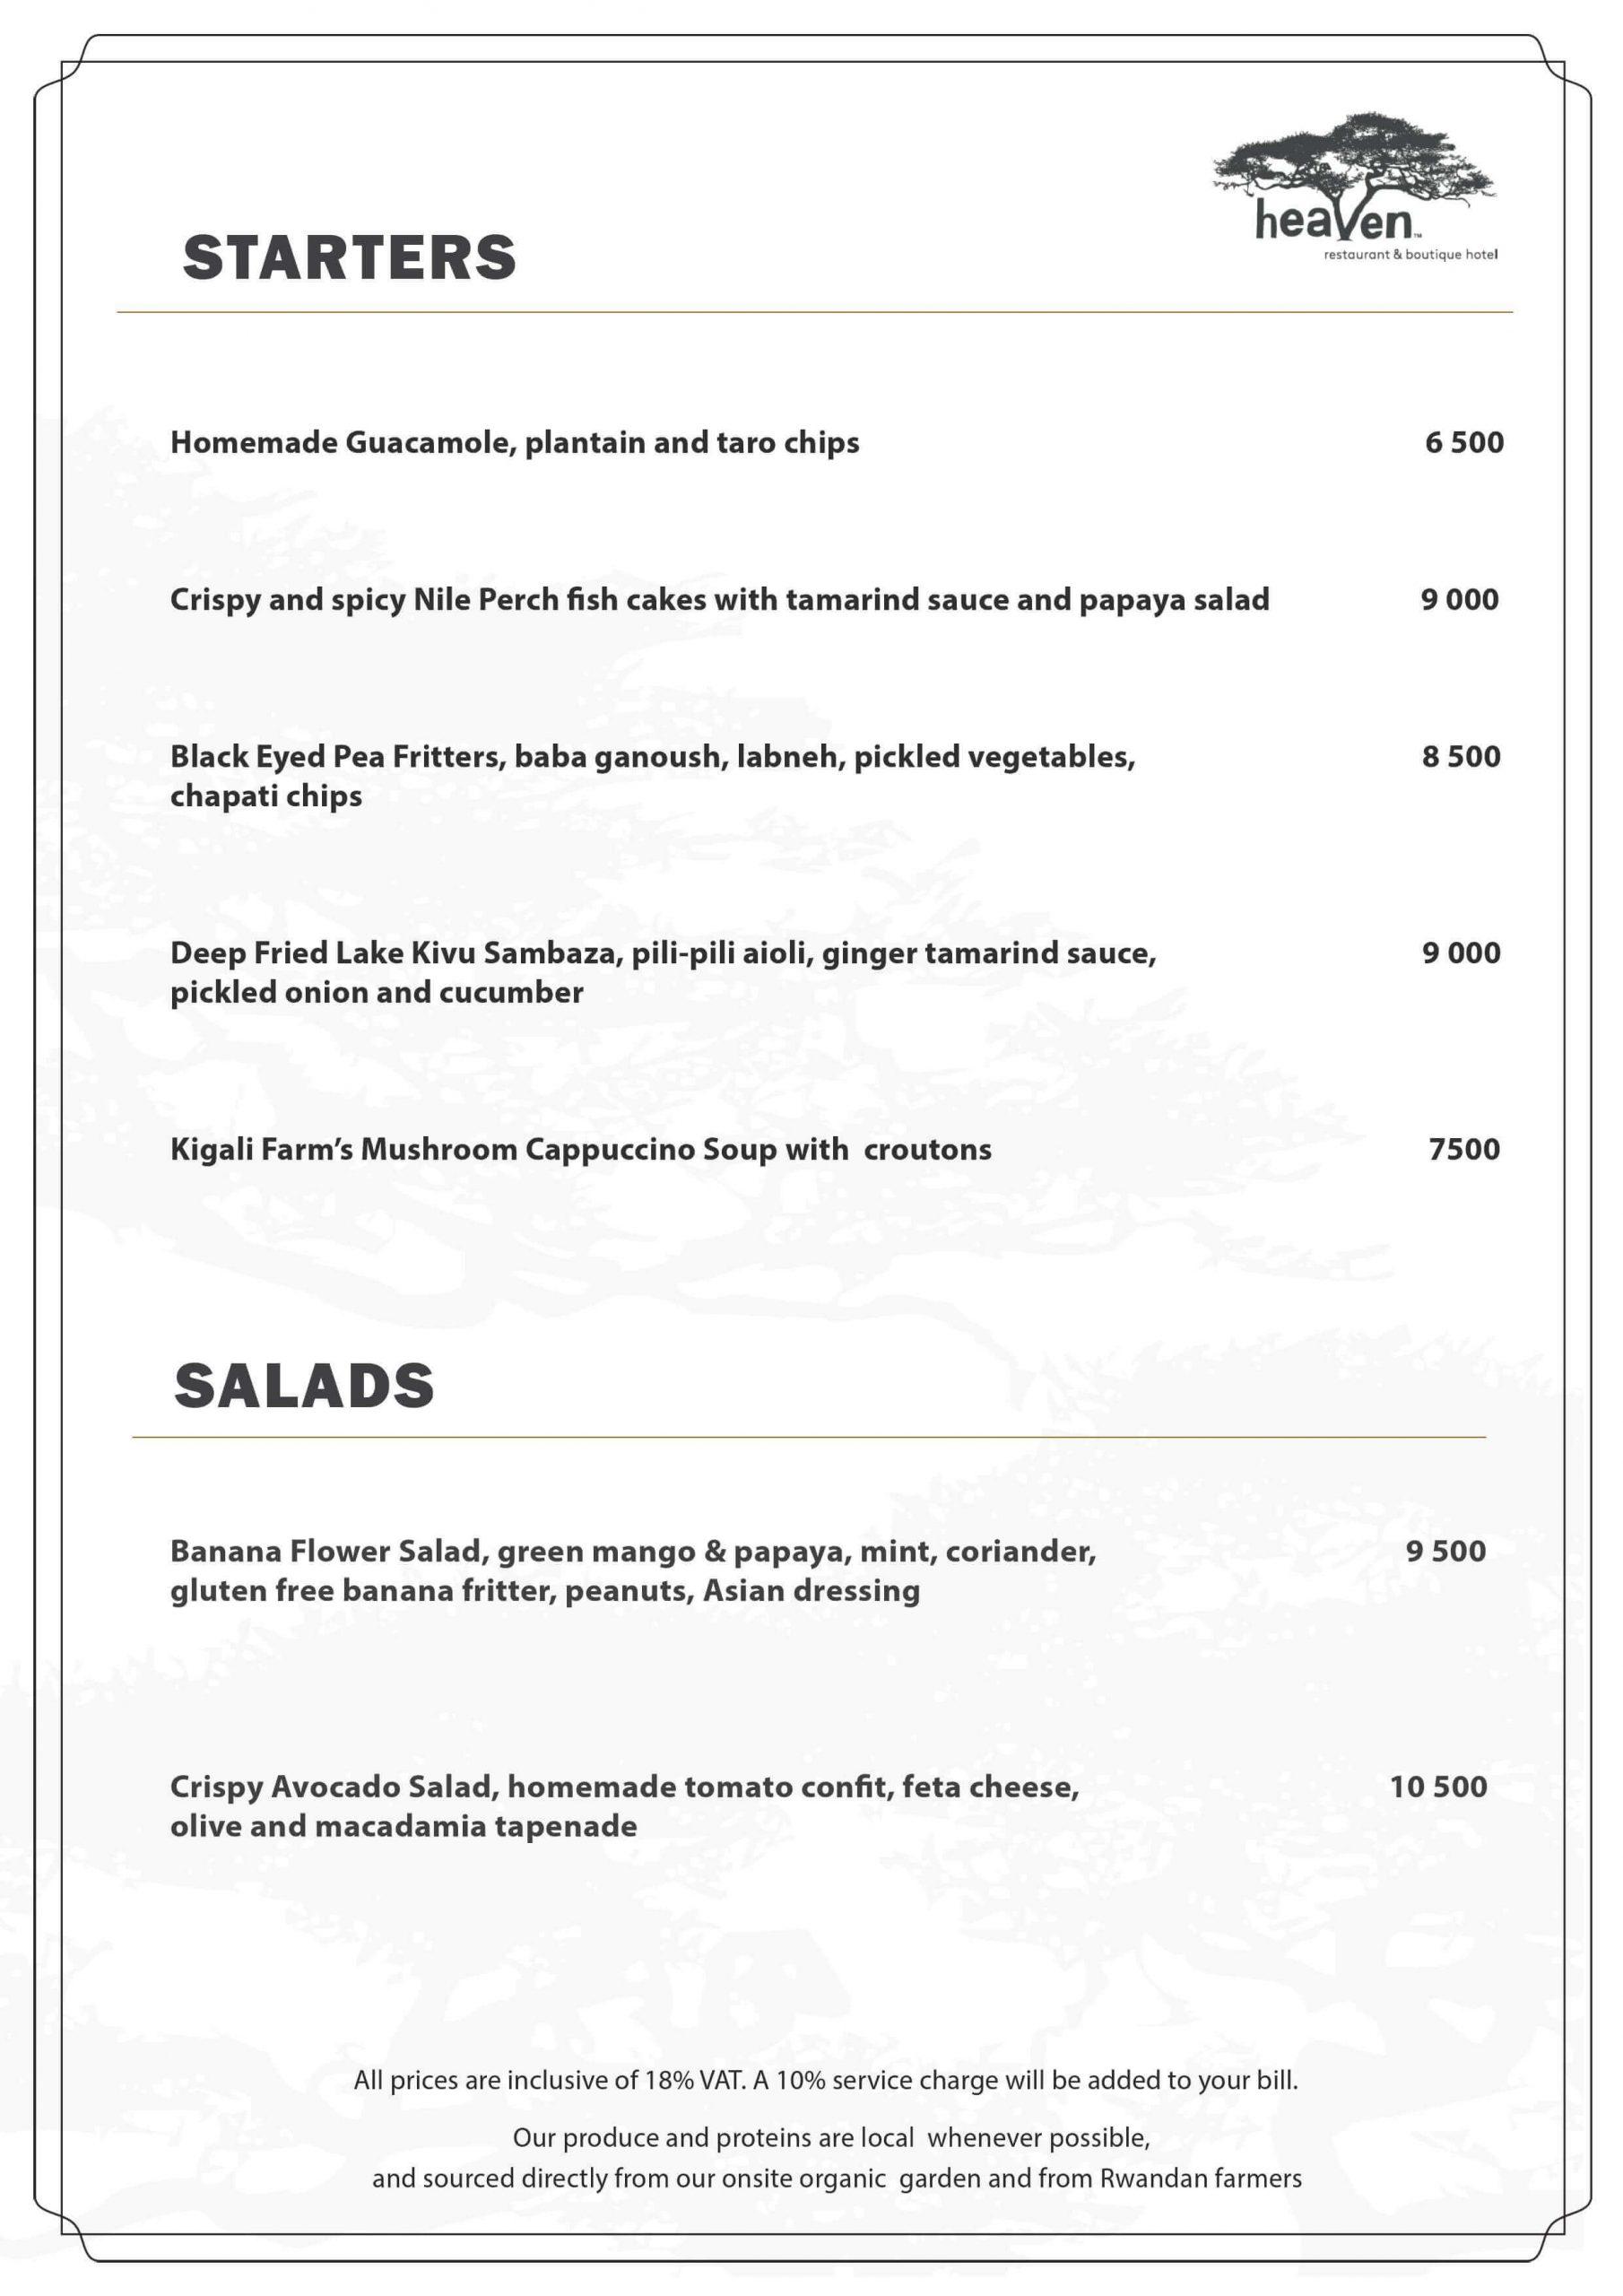 Starters- Heaven Restaurant